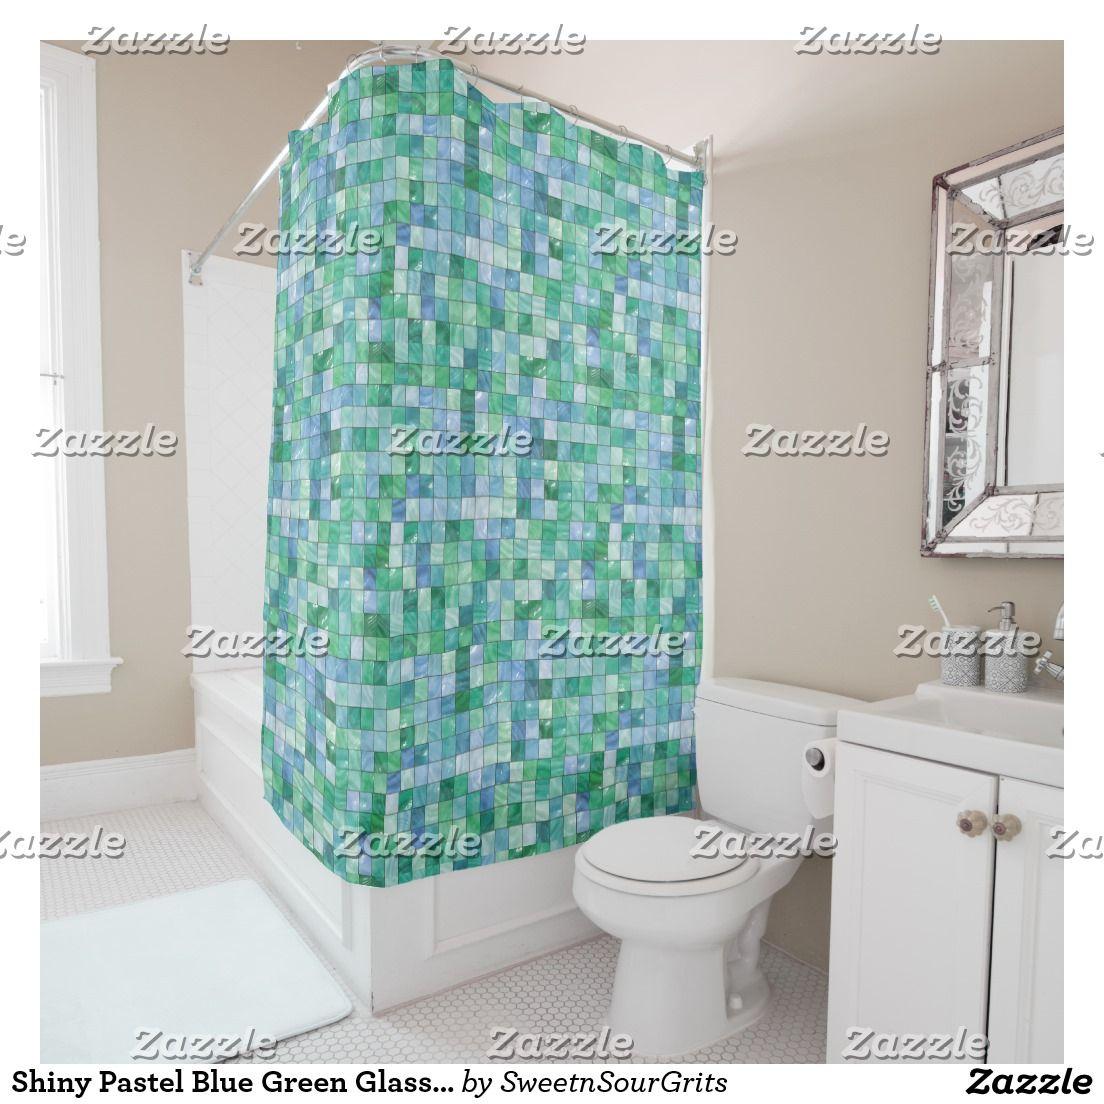 Shiny Pastel Blue Green Glass Block Tile Mosaic Shower Curtain Showercurtain Homedecor Bathroom